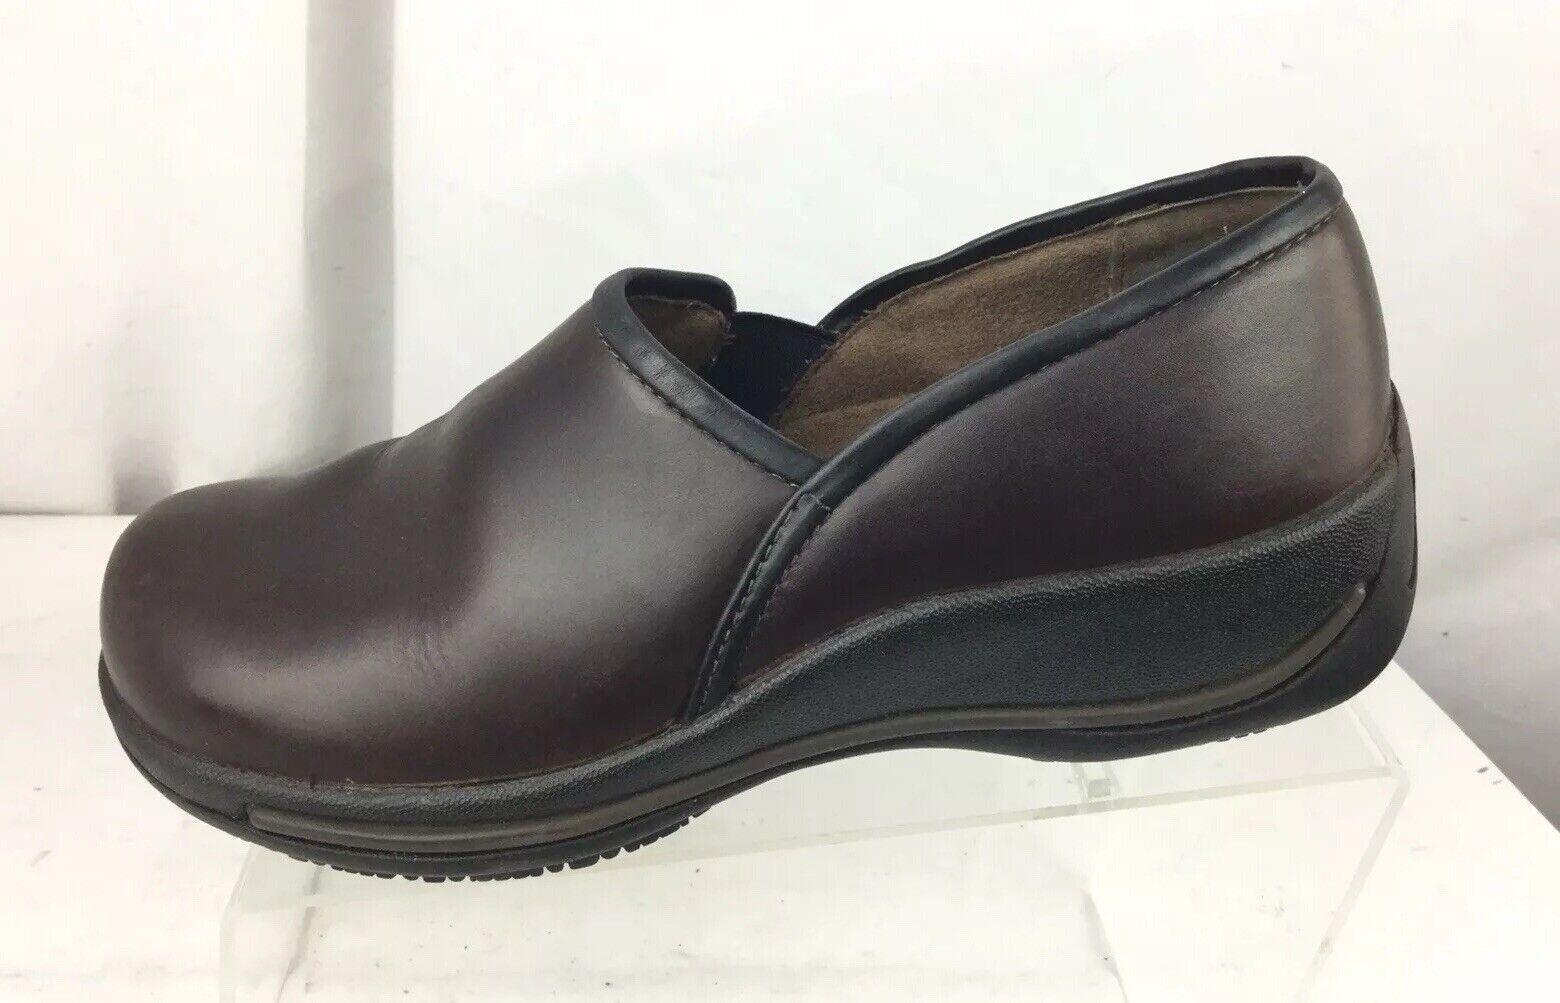 Dansko Caitlin Womens Size 40 Leather 4042-800200 Slip Resistant shoes Brown